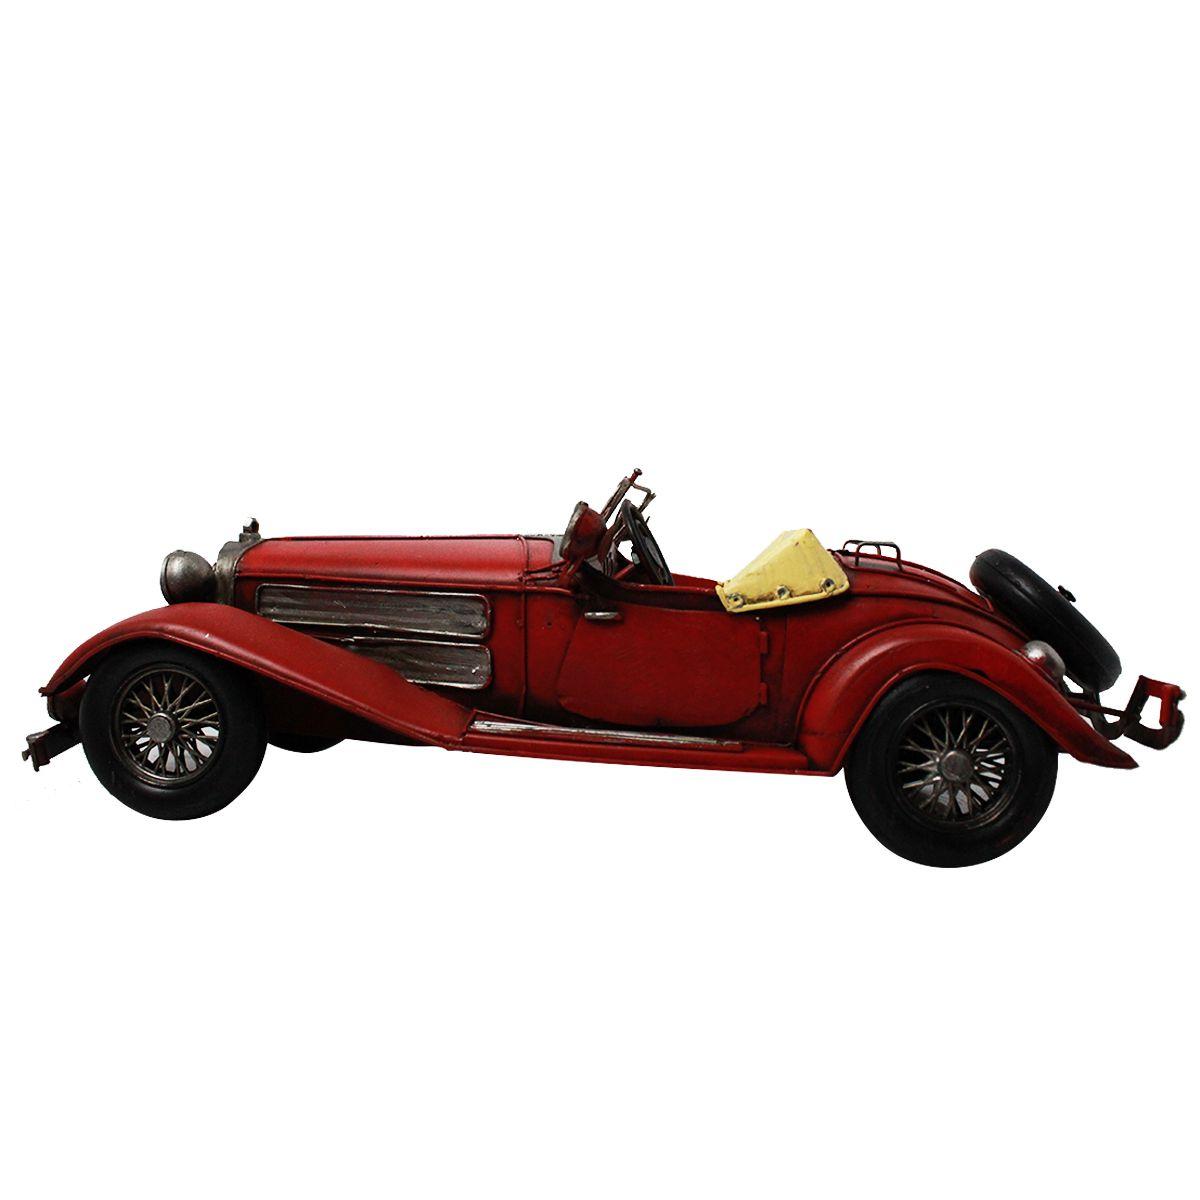 Miniatura de Metal Retrô - Mercedes Benz 500K Vermelha 1936